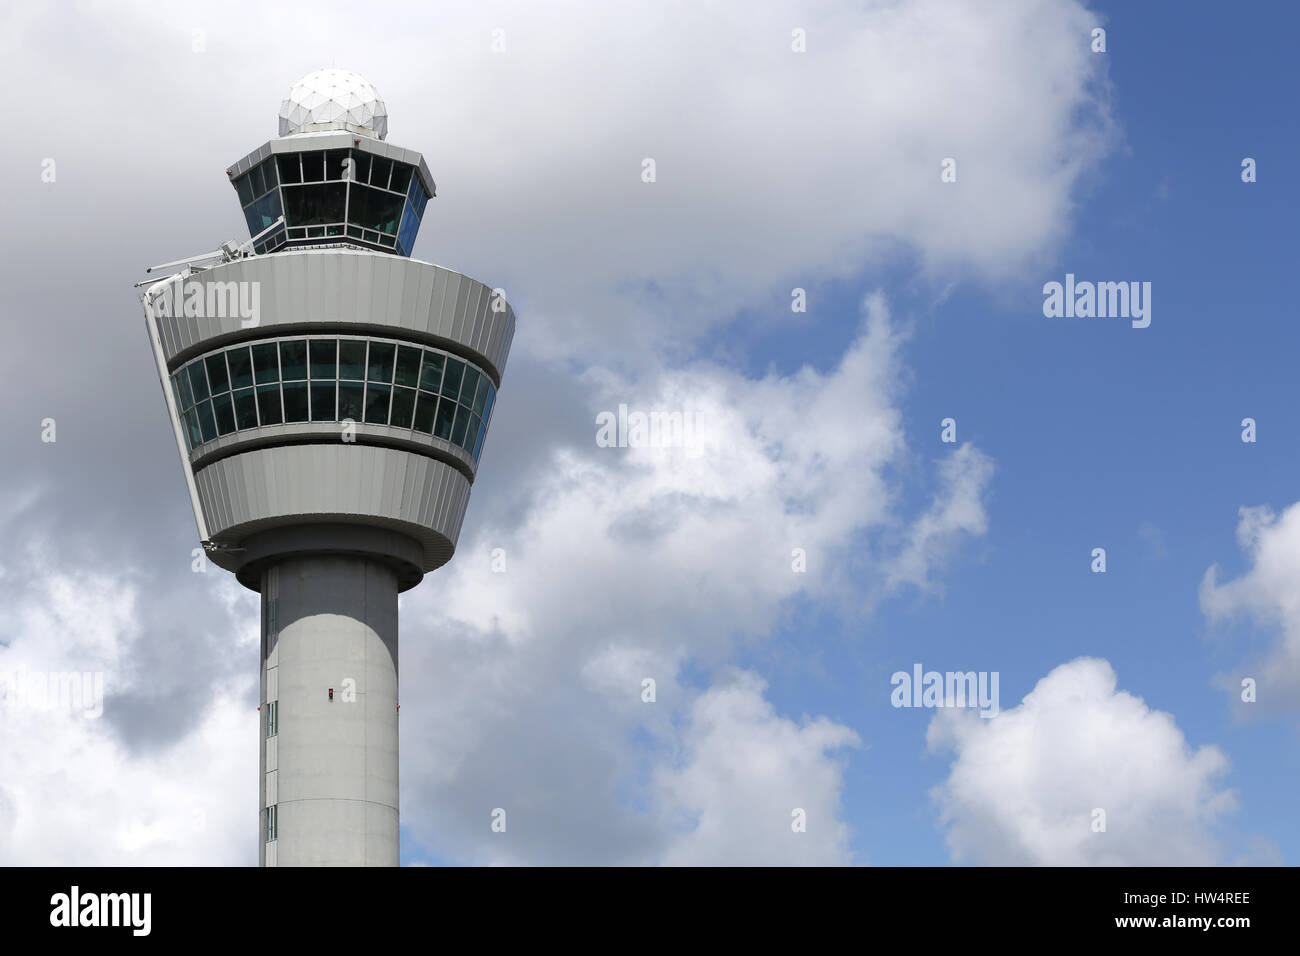 Air Traffic Control Radar Stock Photos & Air Traffic Control Radar ...